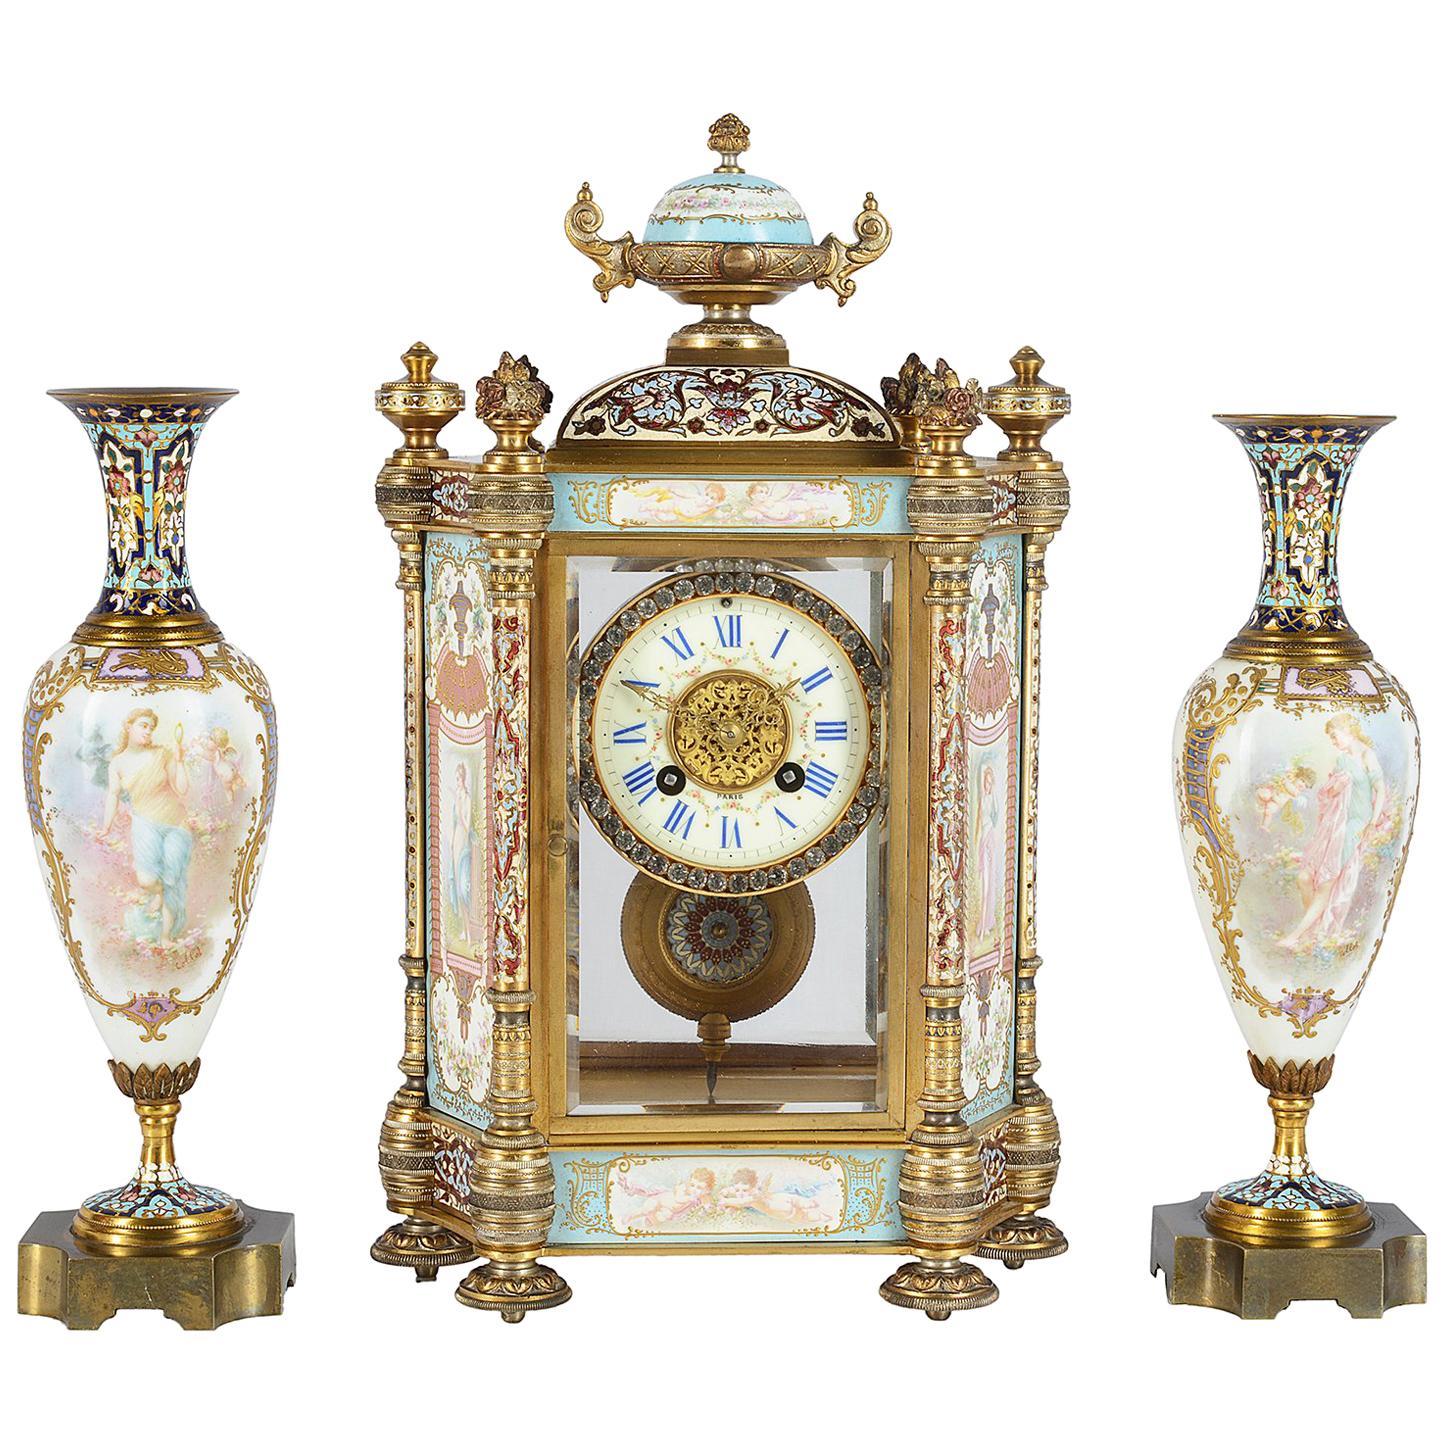 19th Century French Champlevé Enamel Clock Garniture